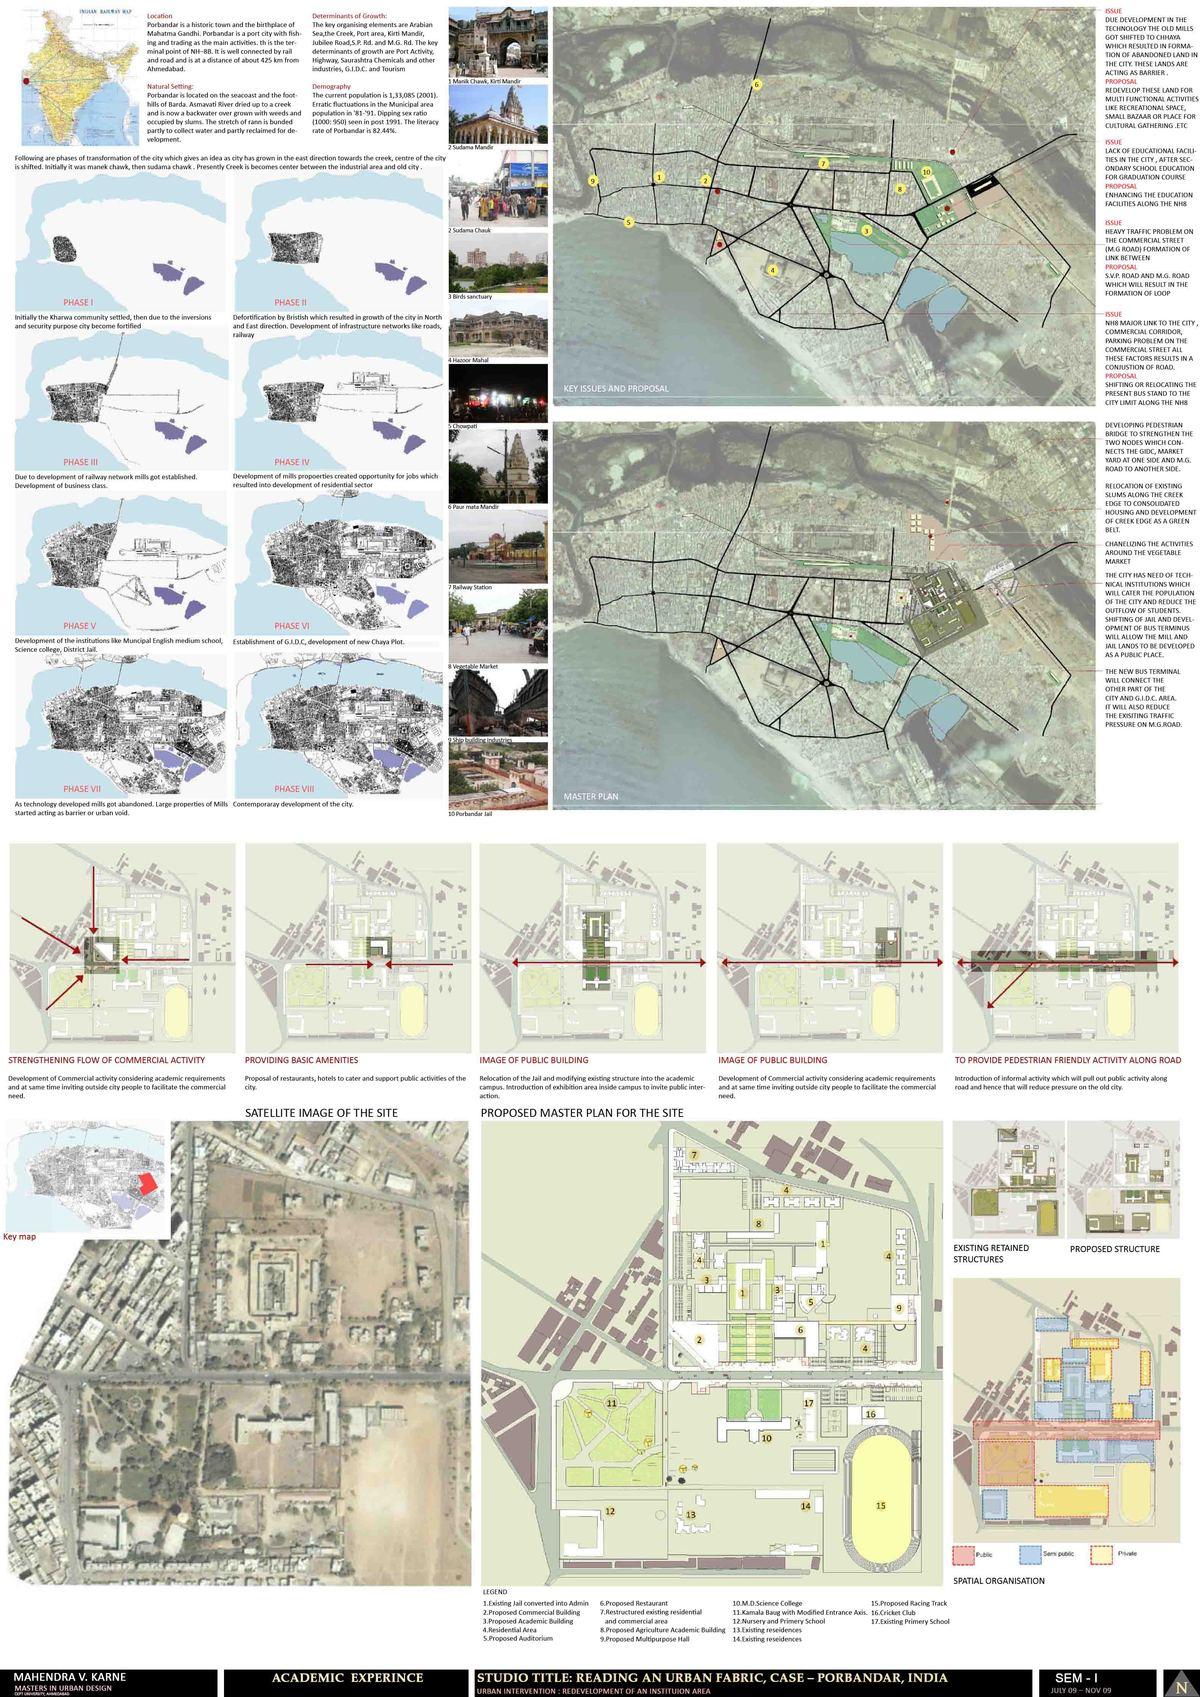 Academic experience-Porbandar City (India) 1/2